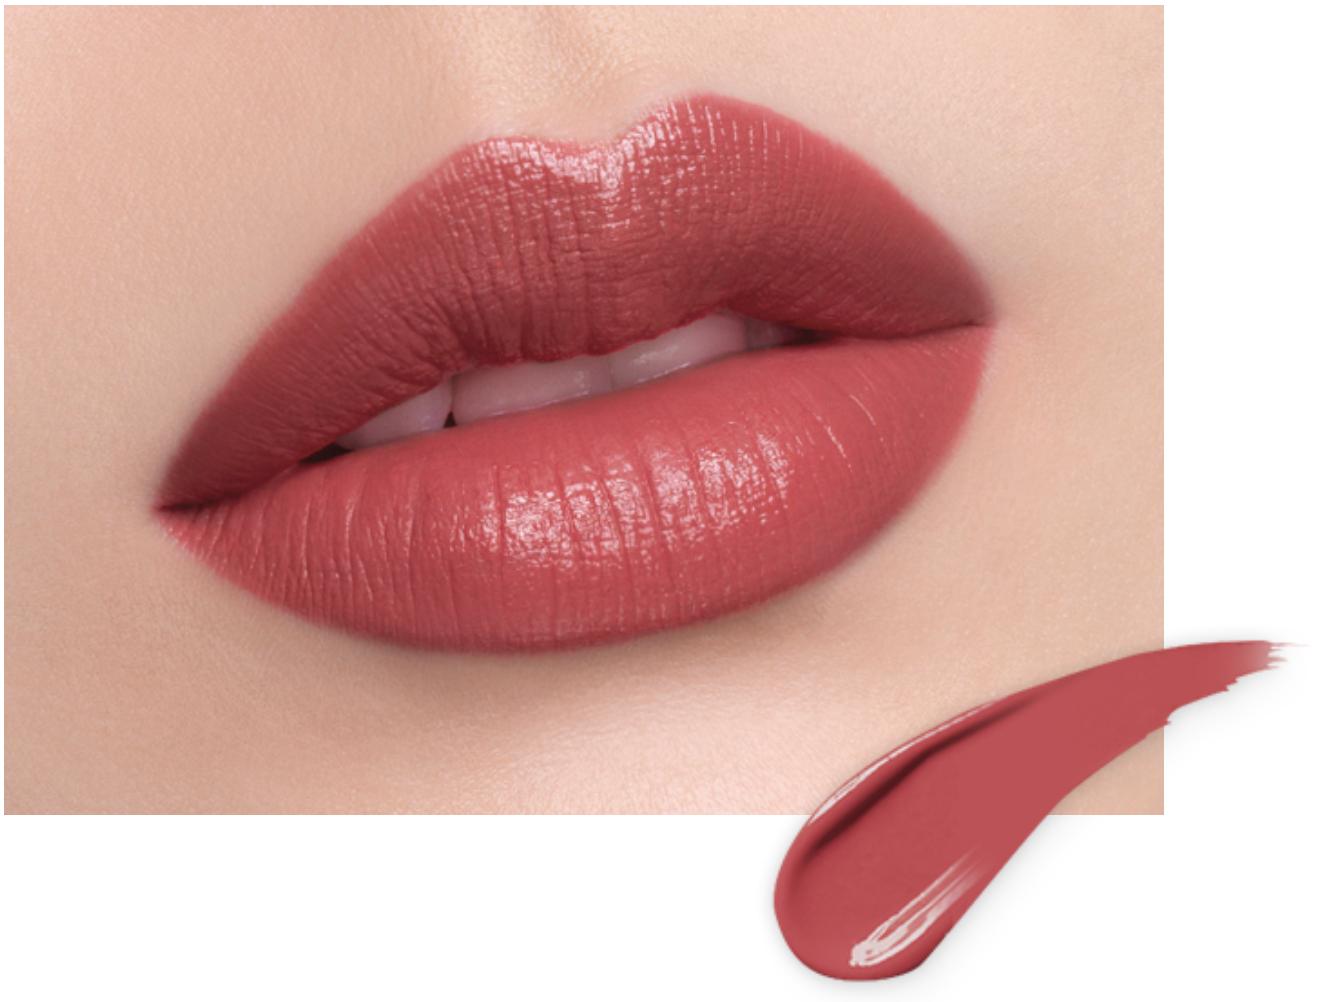 laneige-silk-intense-lipstick-013.png